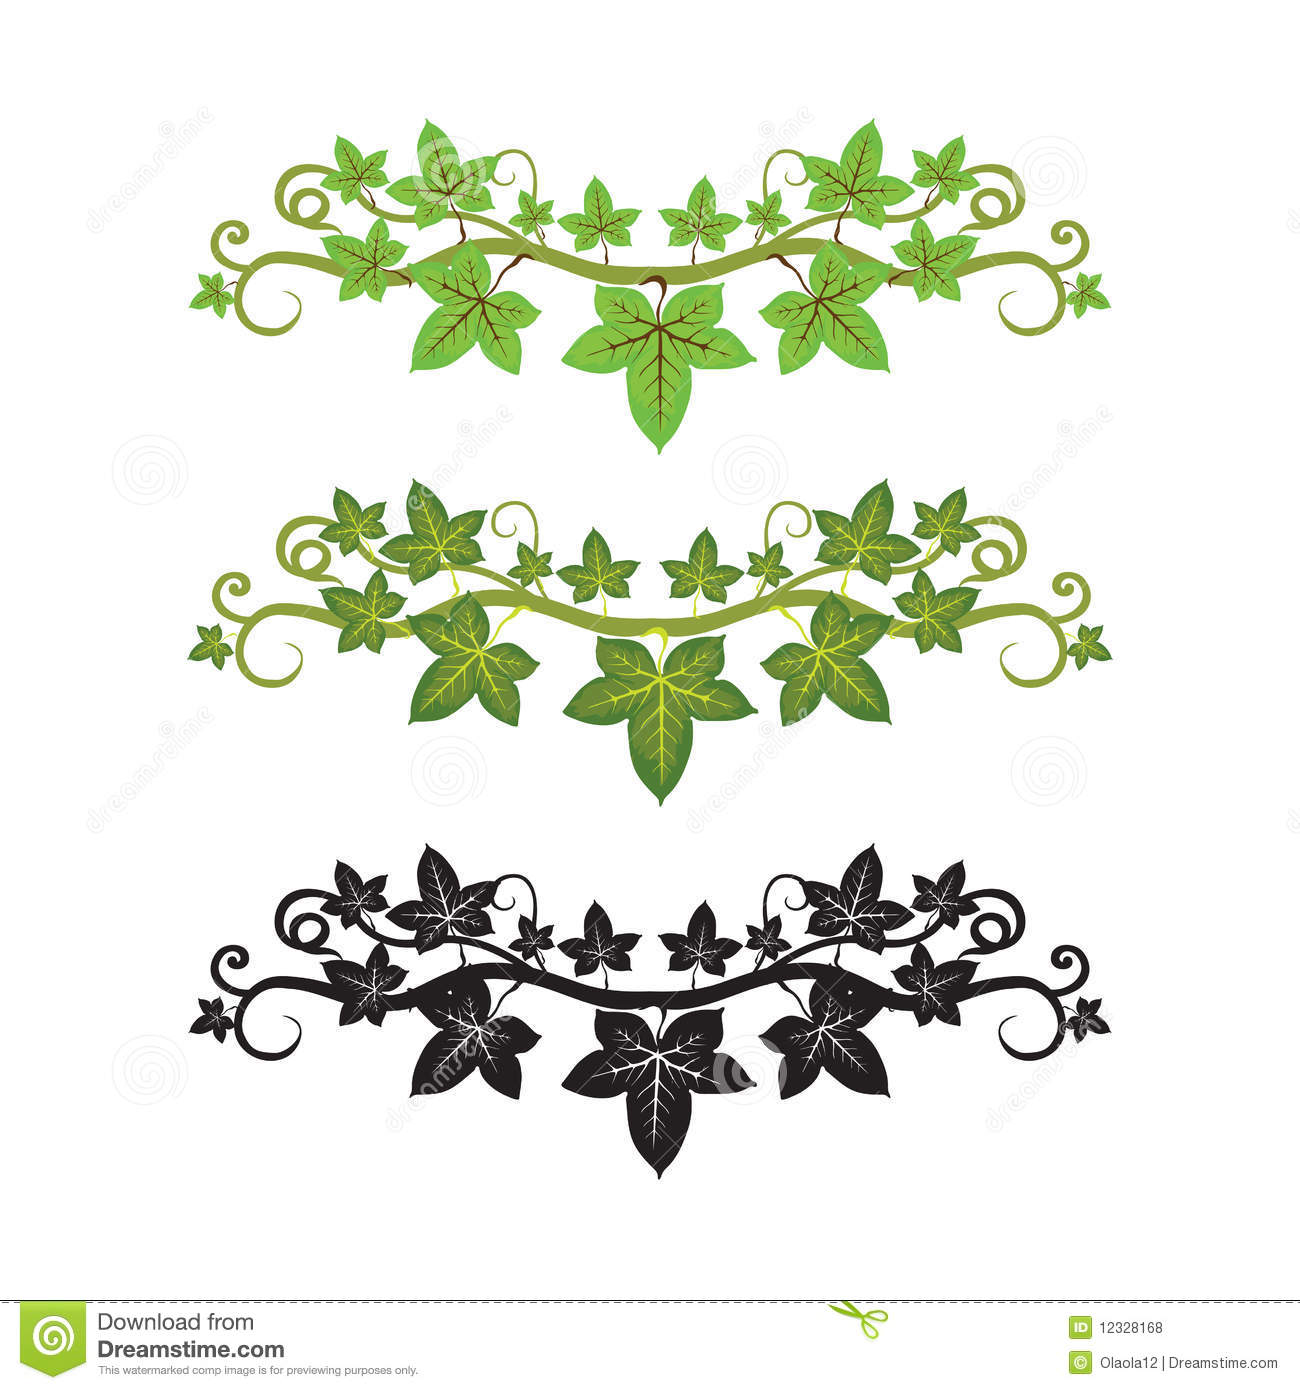 Ivy border clip art free.